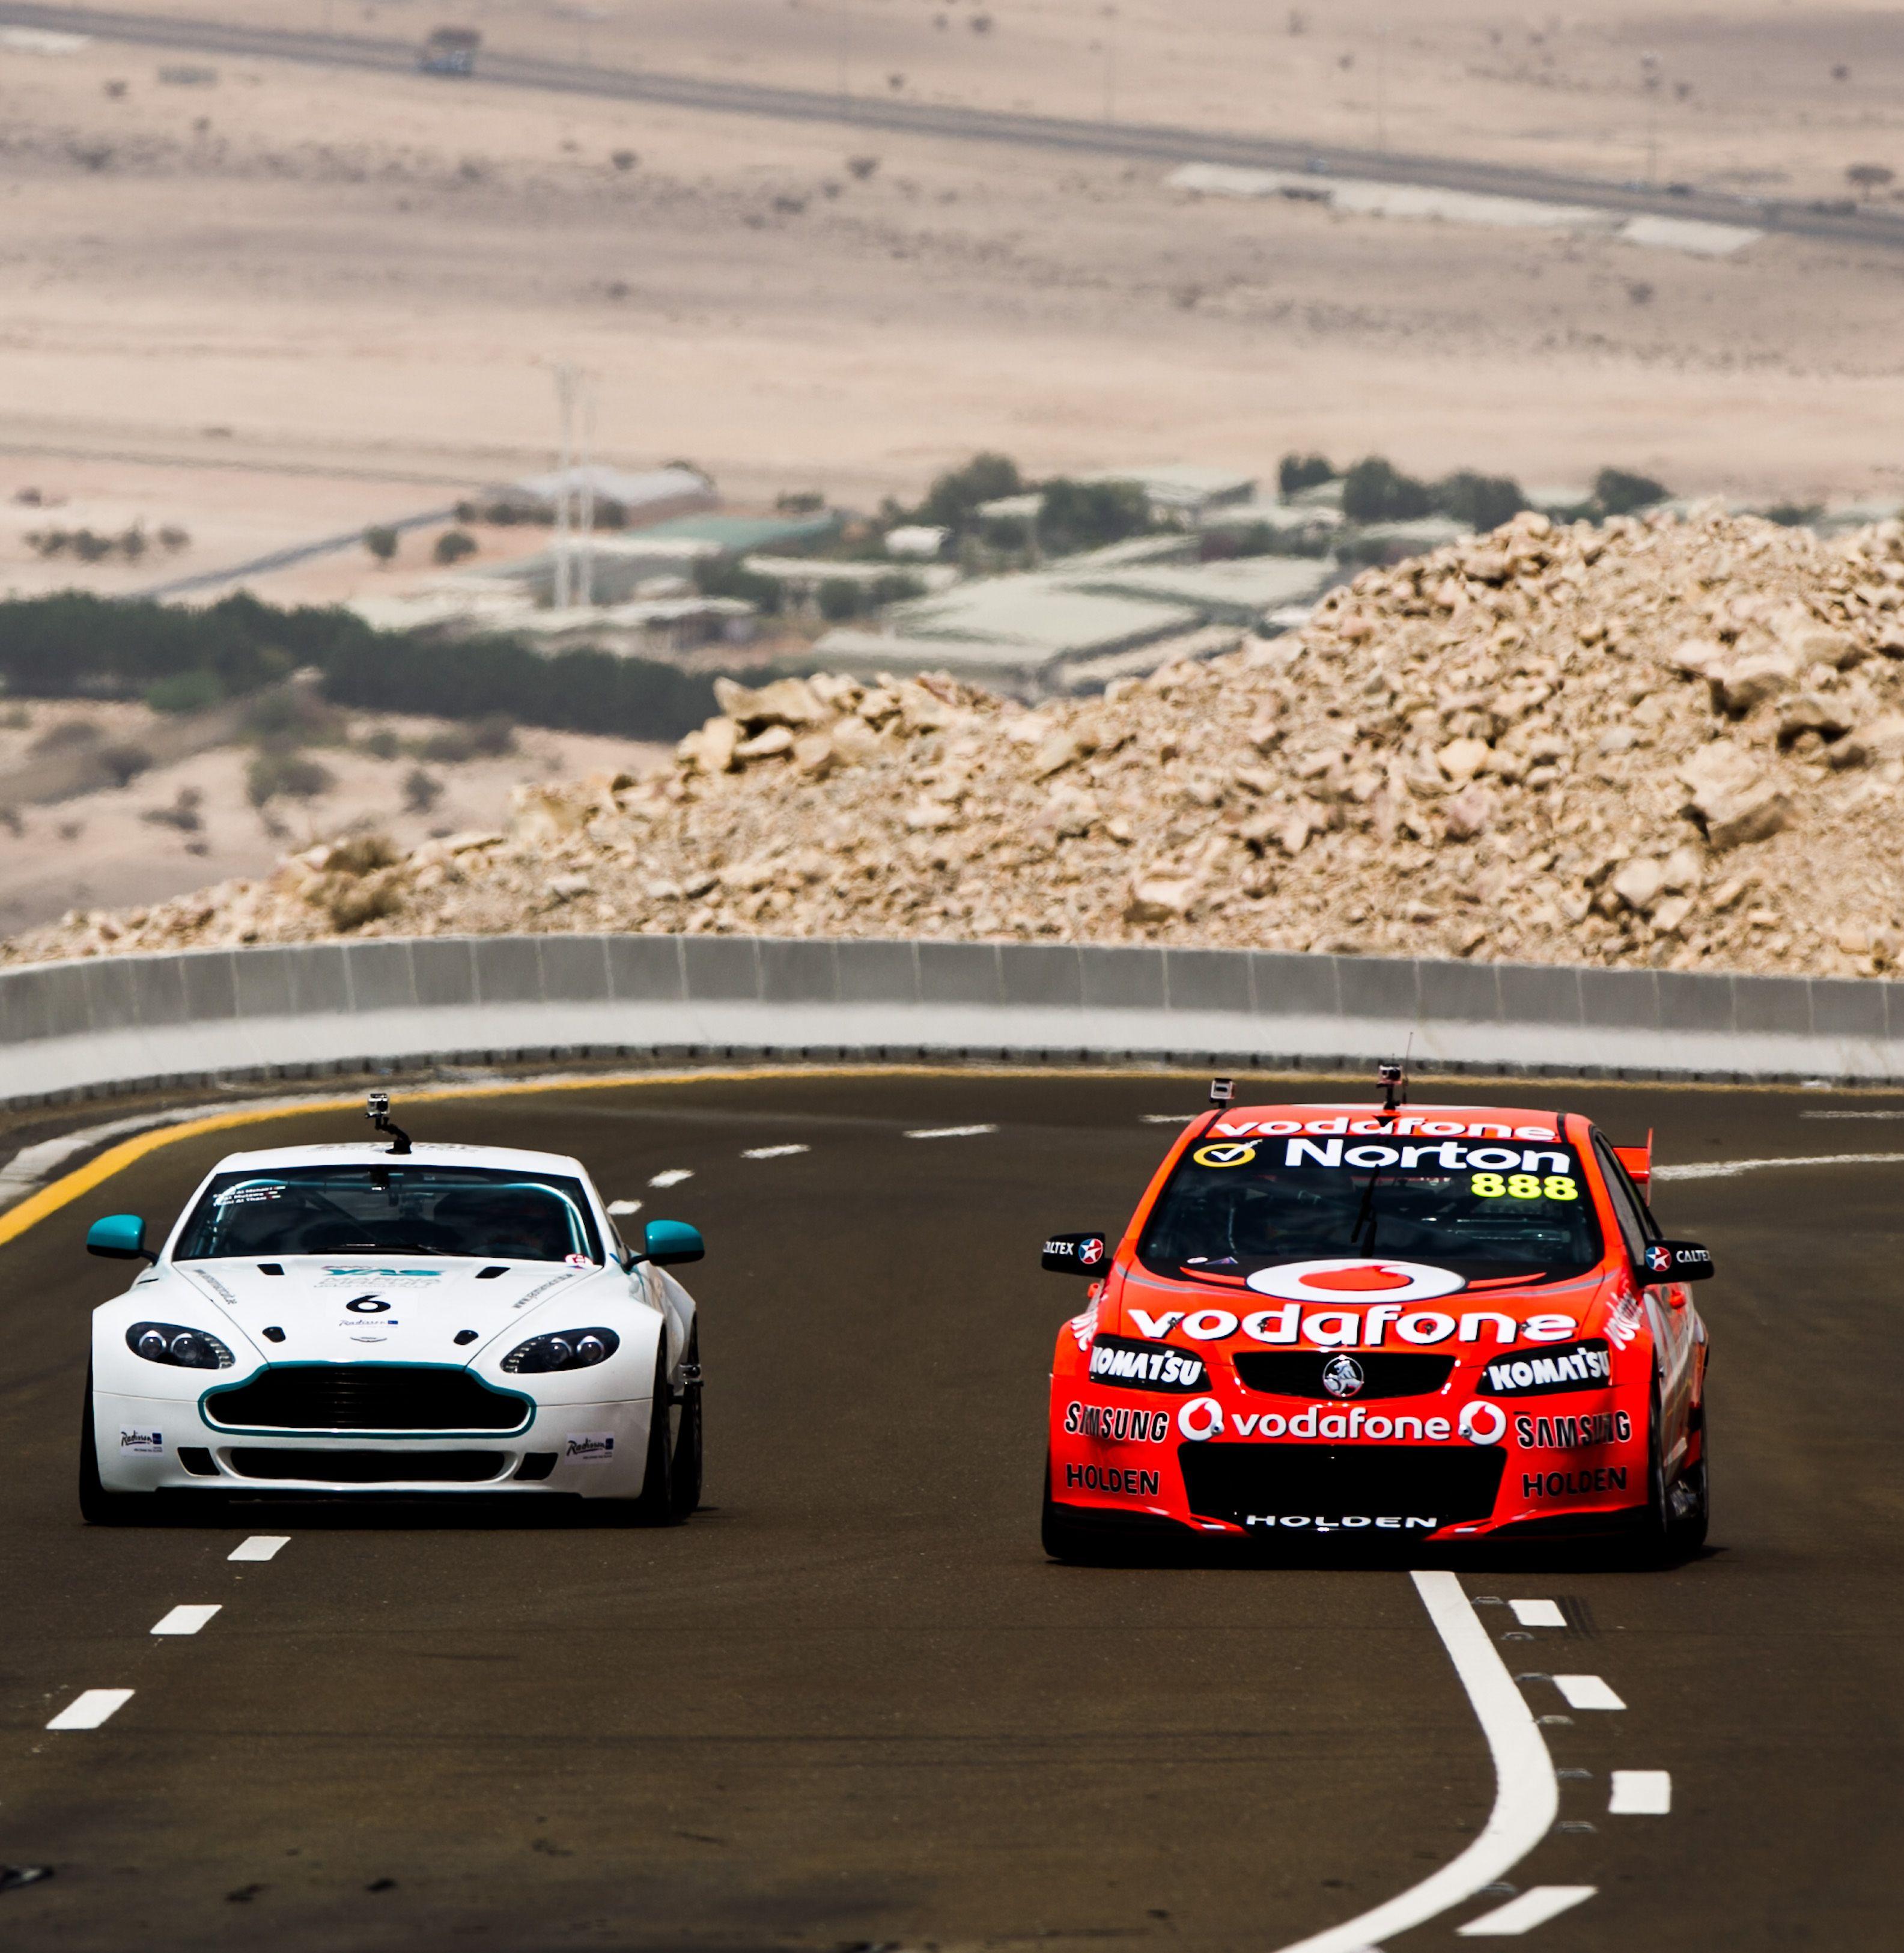 Australian V8 Supercar Races Yas Marina Circuit S Aston Martin Gt4 In The Desert Outside Abu Dhabi Uae Racing Super Cars V8 Supercars Australia